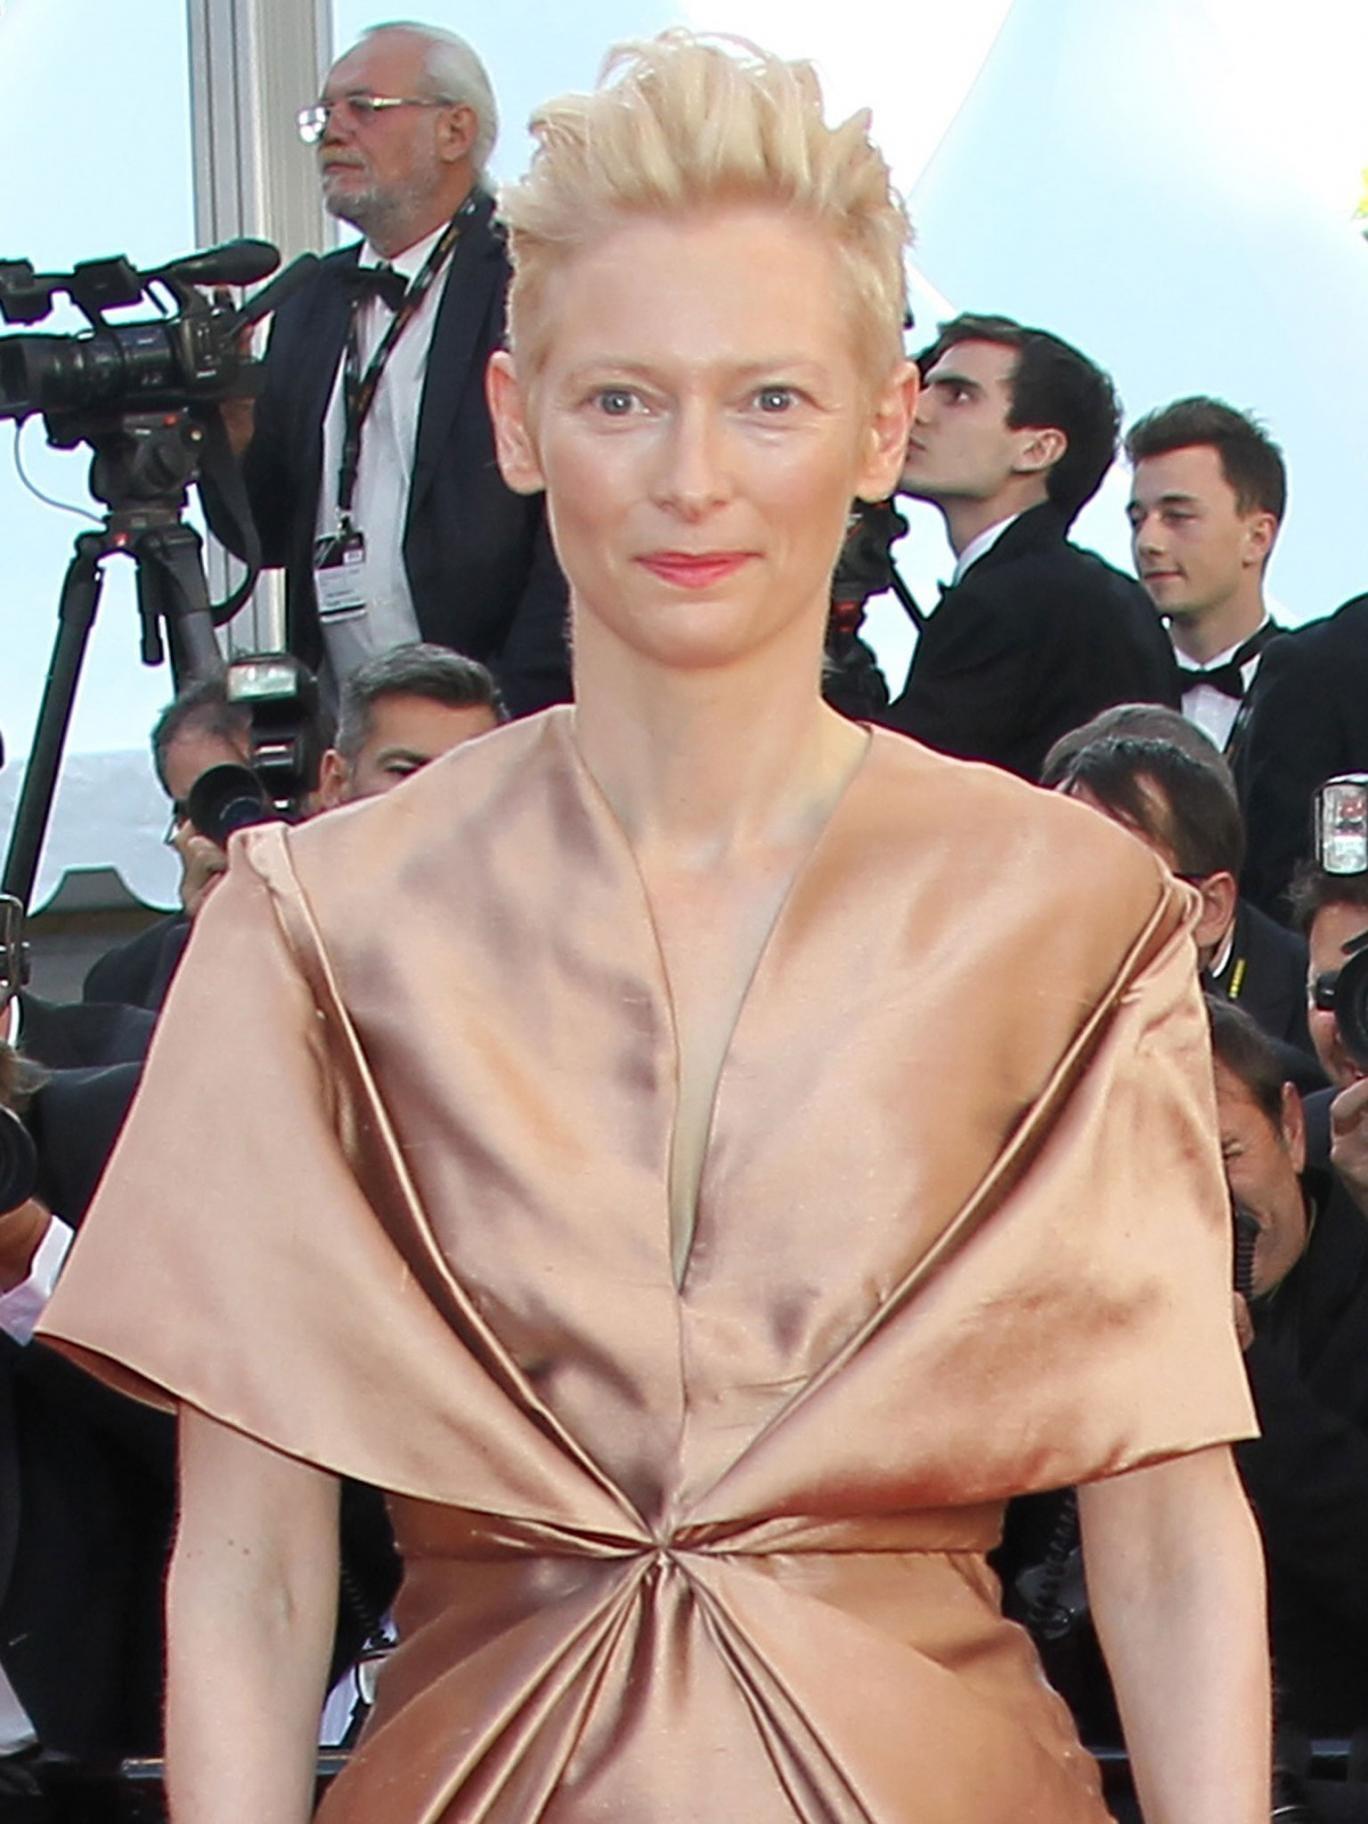 Tilda Swinton, actress